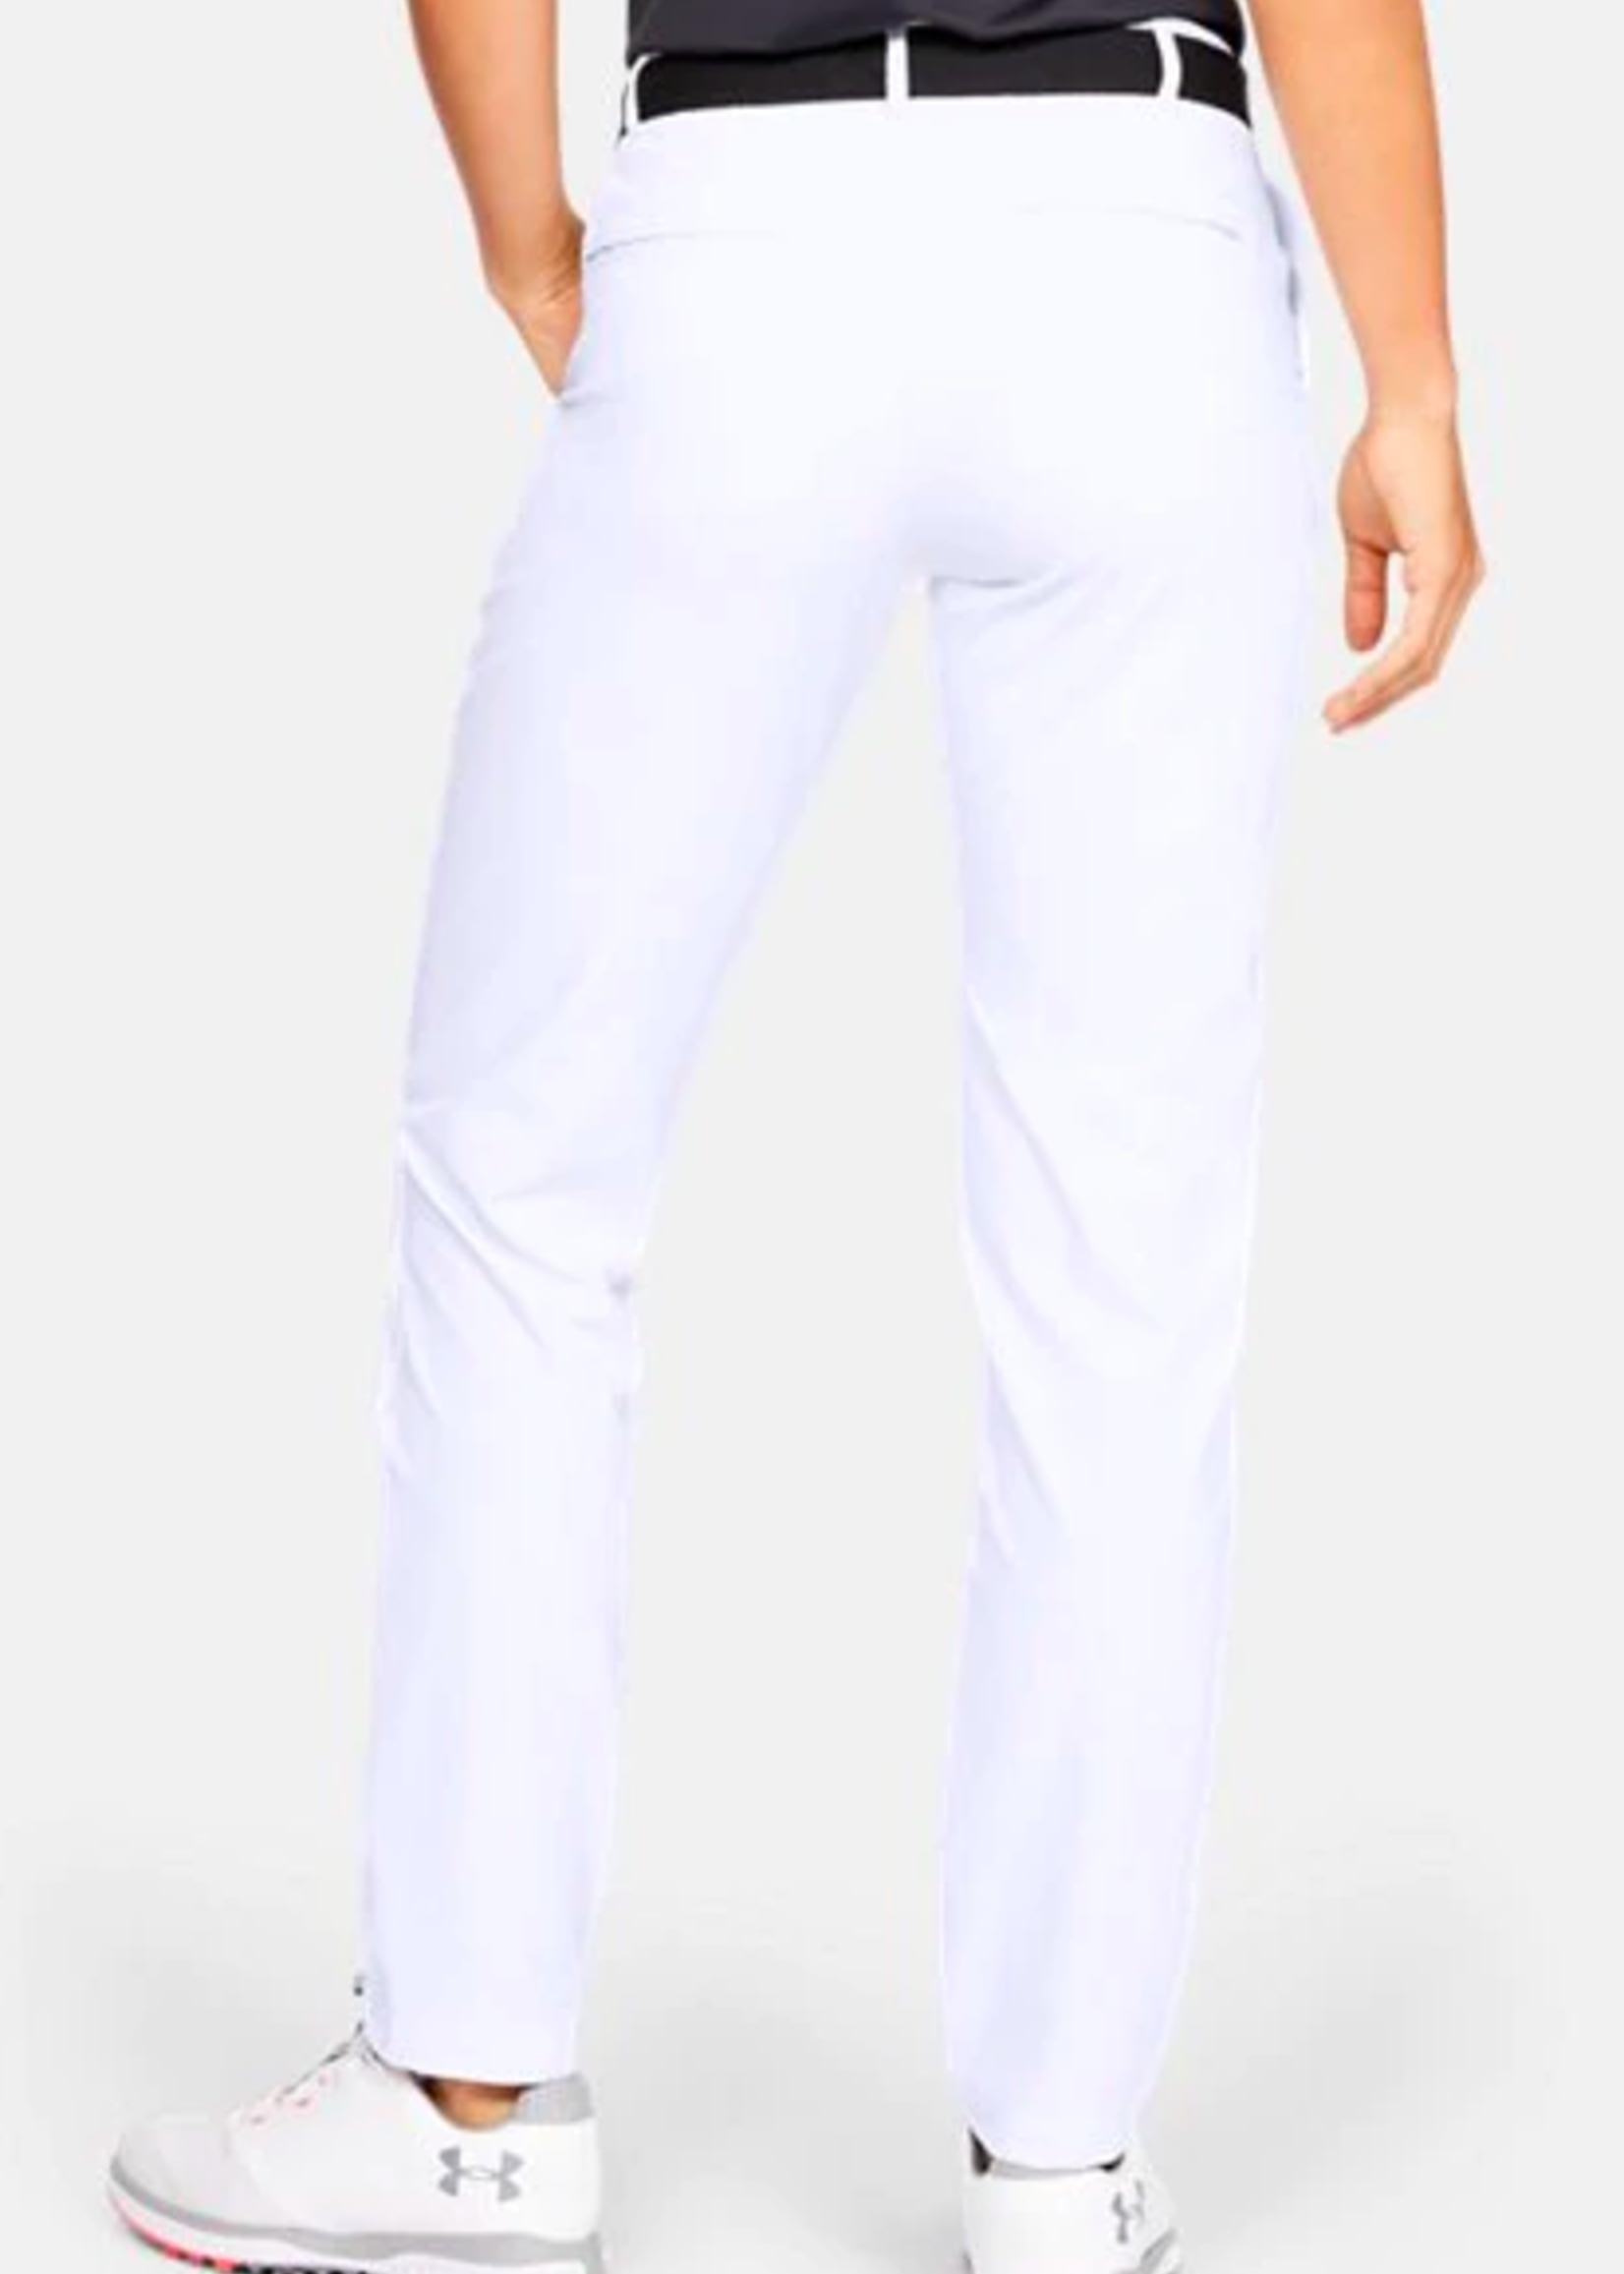 Under Armour UA Links Pant-White / Mod Gray / White